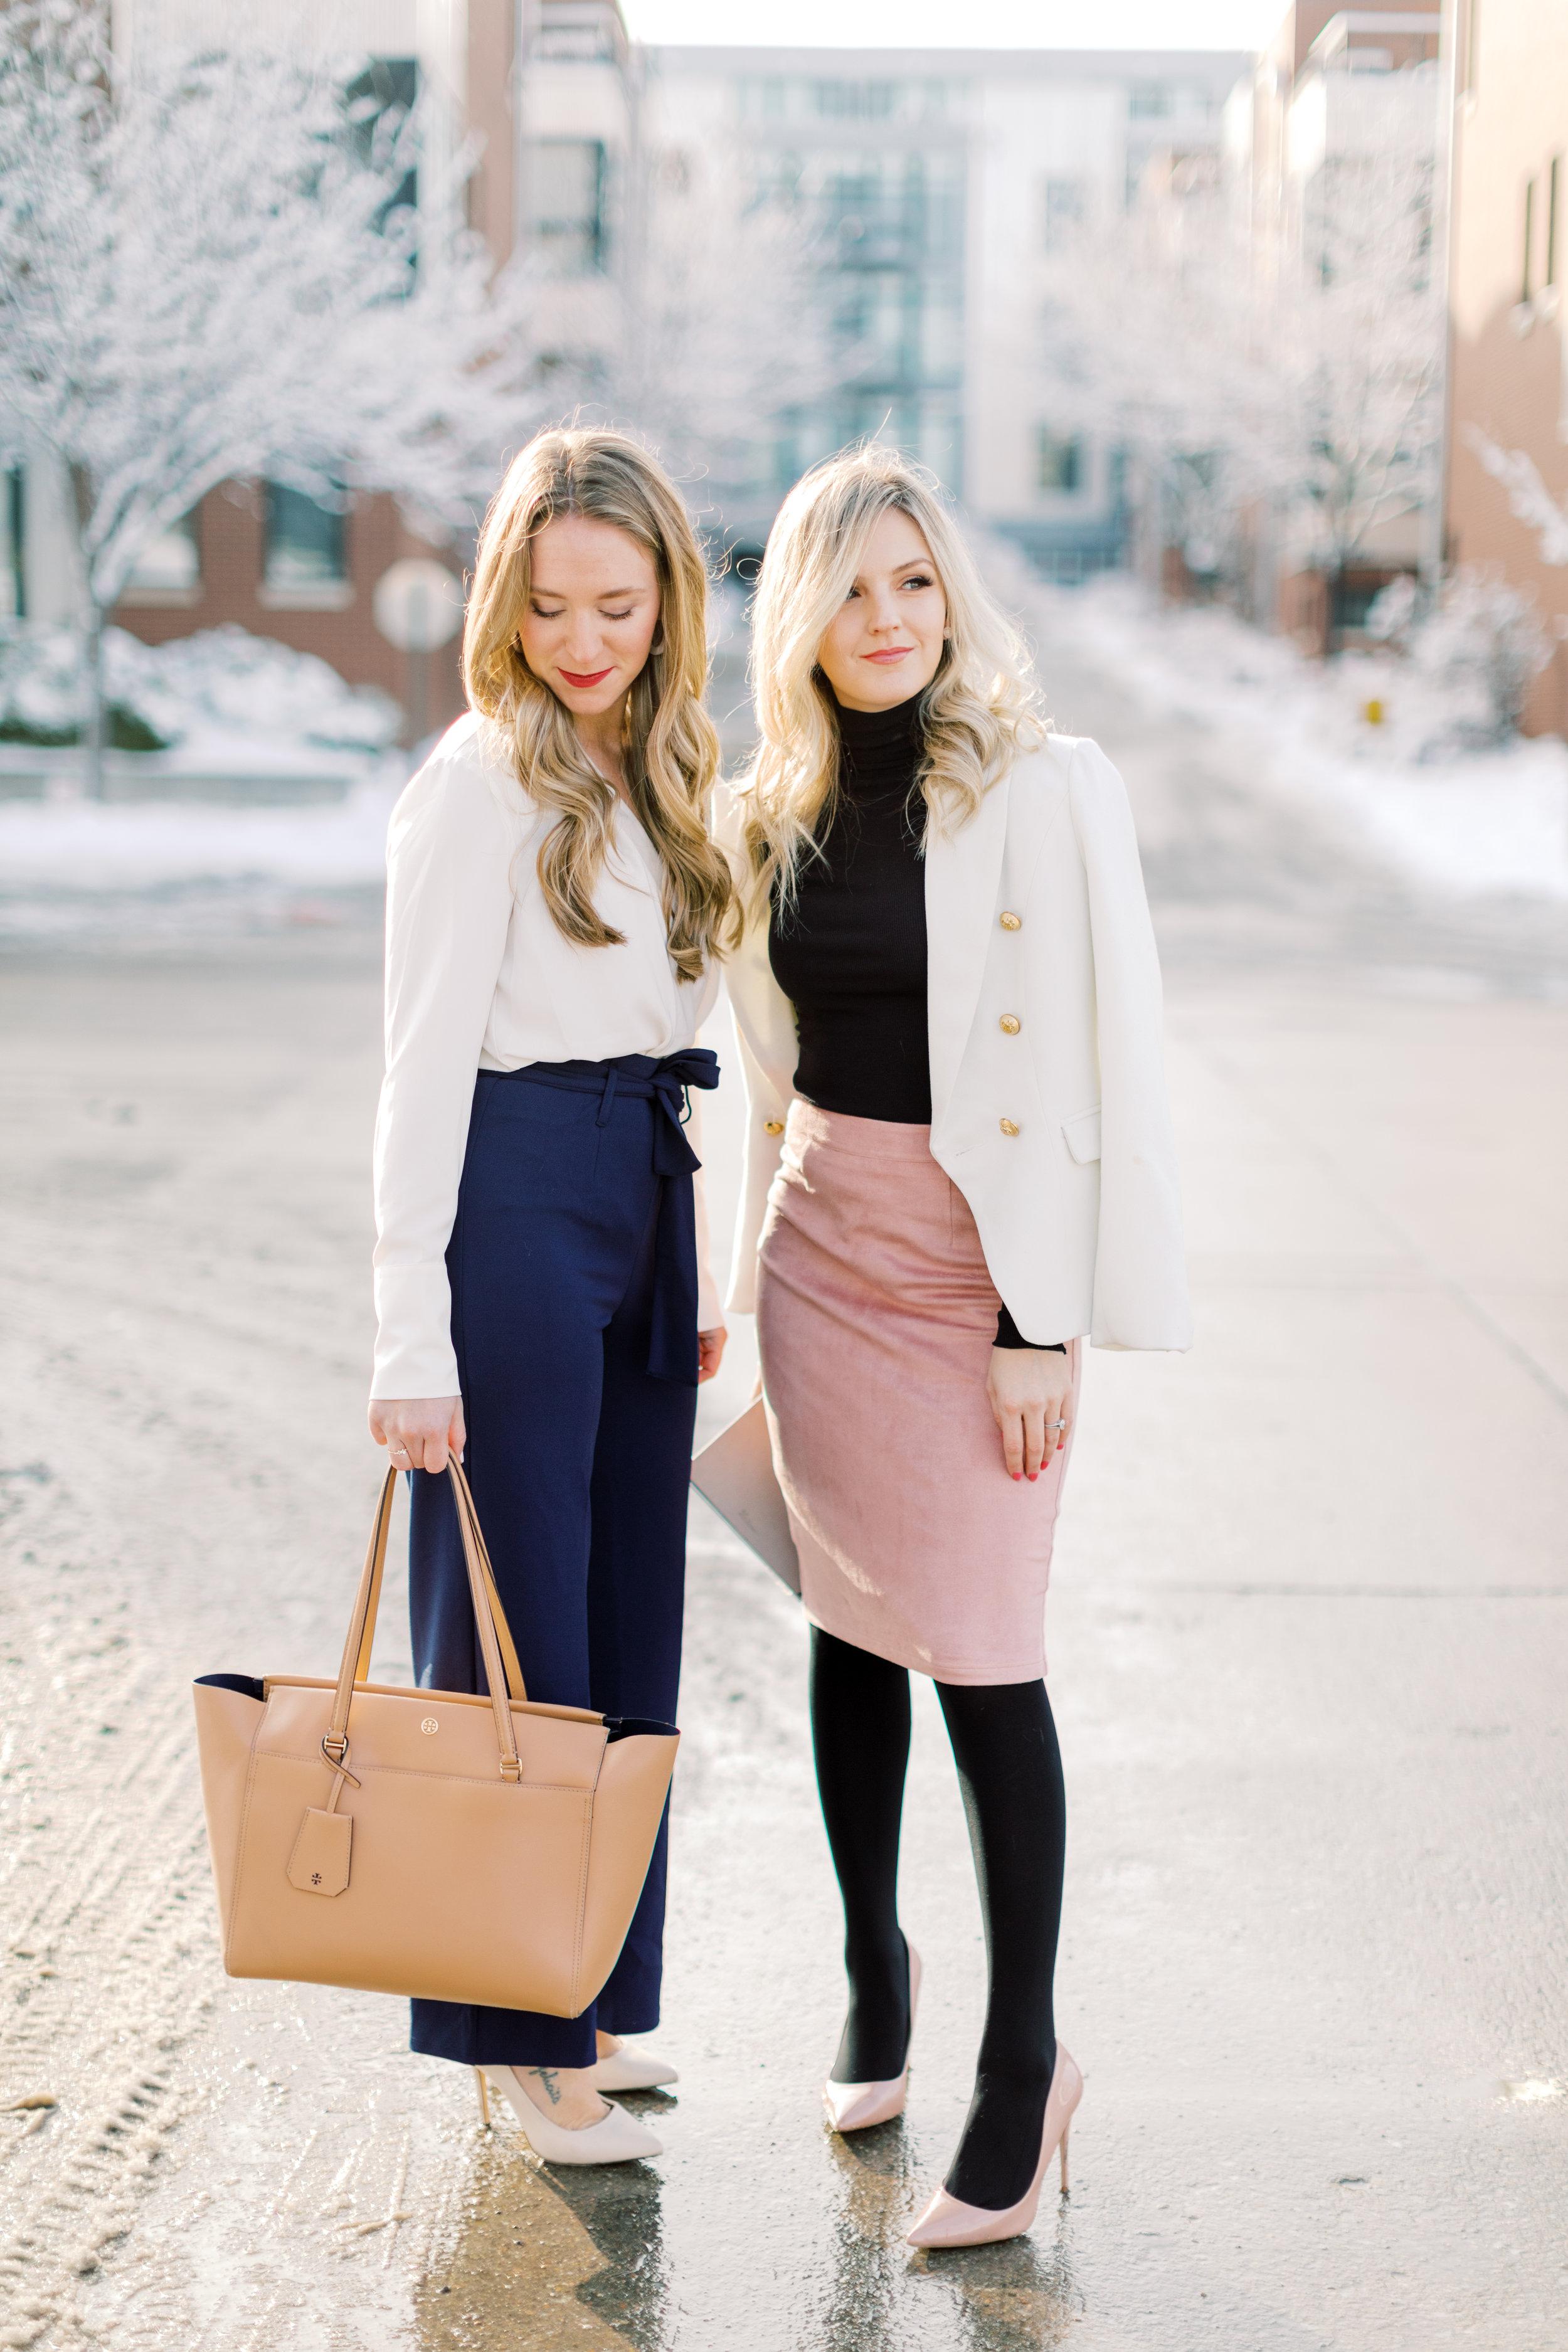 03 - © 2019 Ashley Nicole Photography - Omaha Nebraska - Fashion Blogger - Clocking Out Blog.jpg